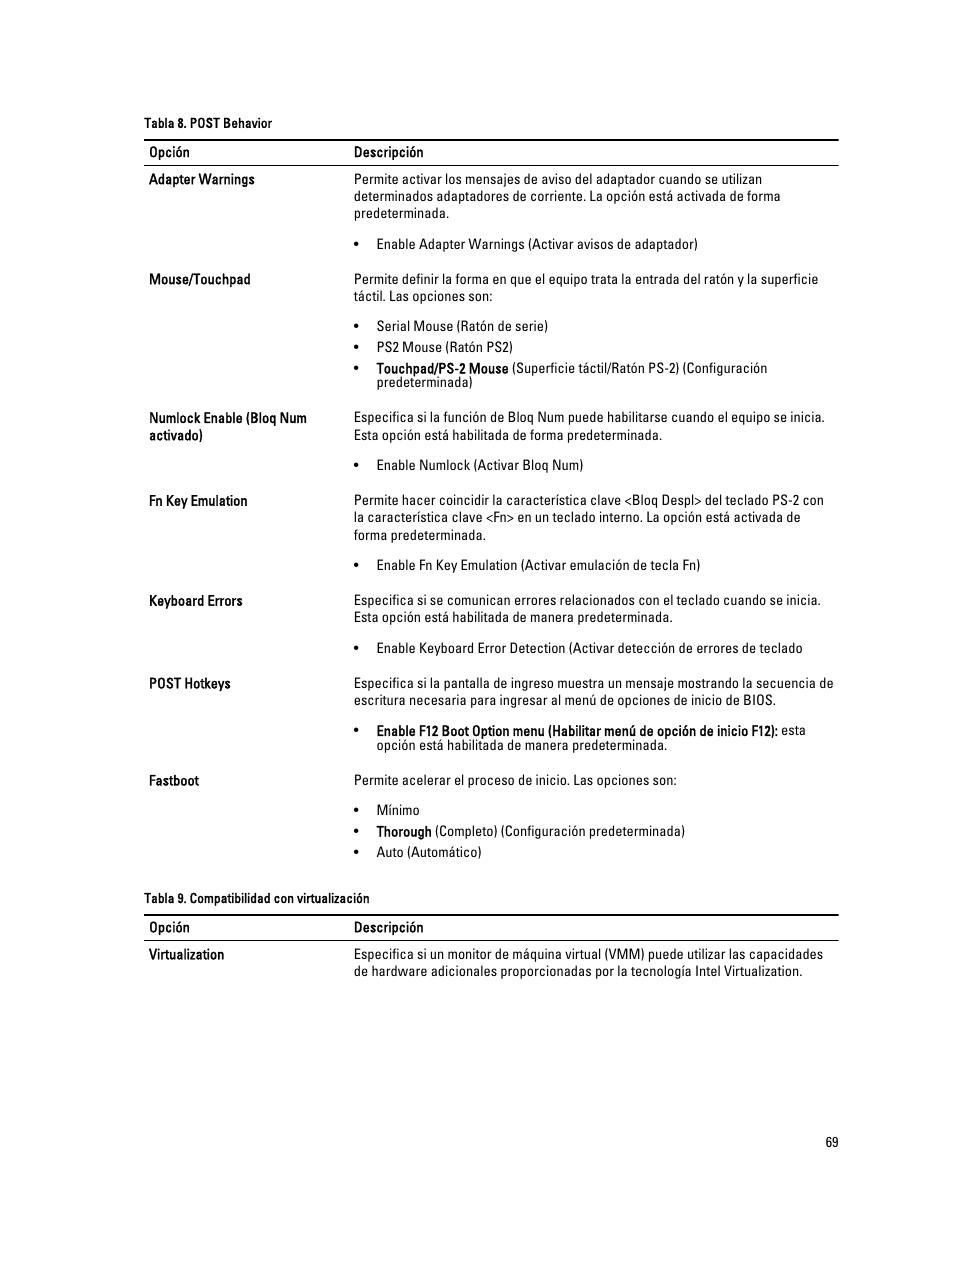 Dell Latitude E6330 (Mid 2012) Manual del usuario   Página 69 / 85